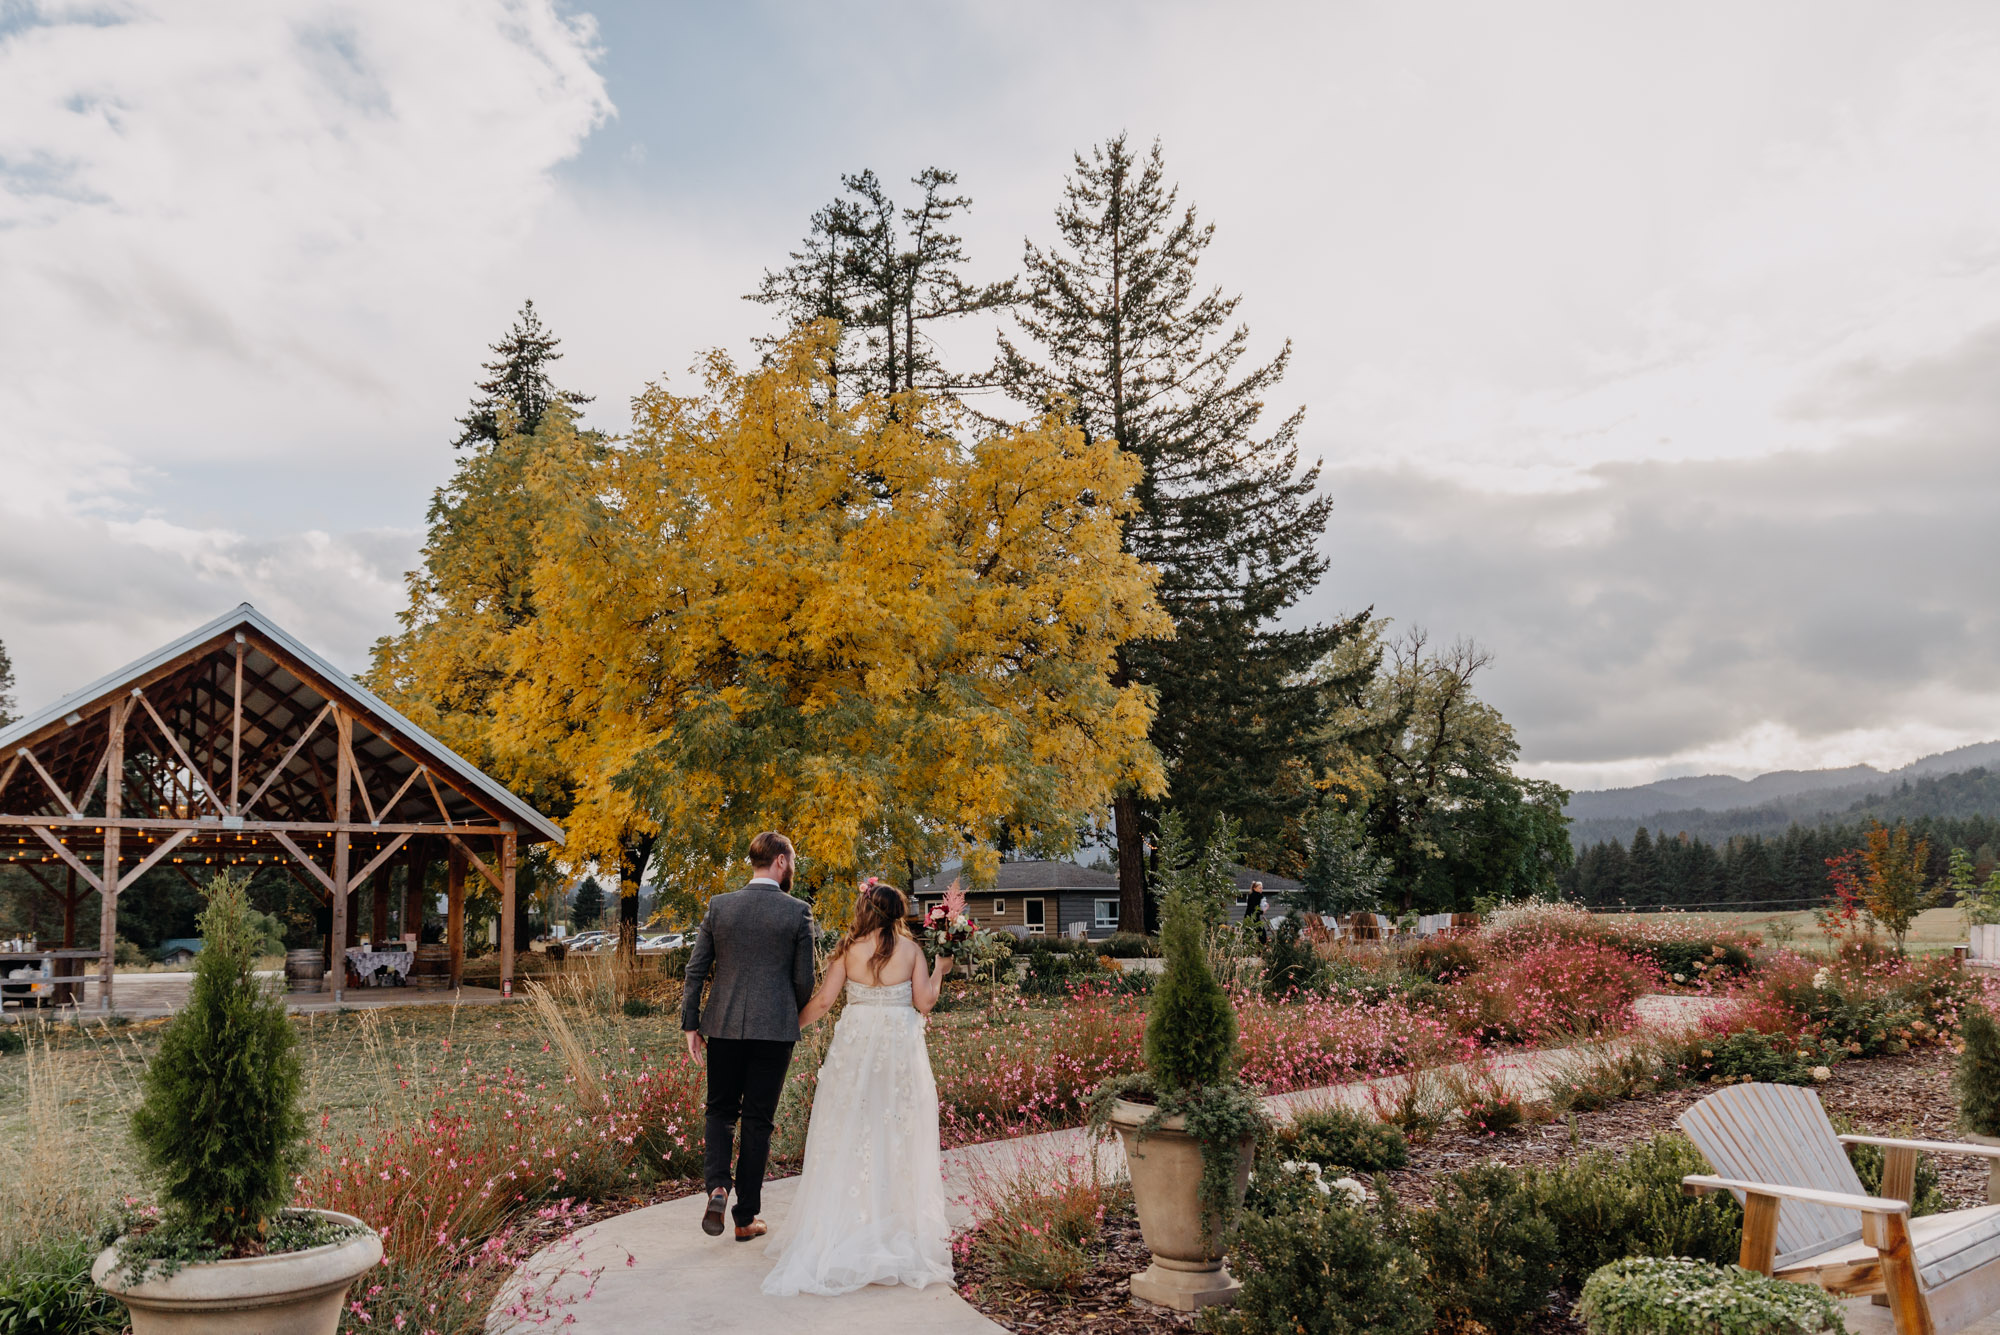 Outdoor-Summer-Ceremony-Washington-Wedding-Rainbow-5466.jpg